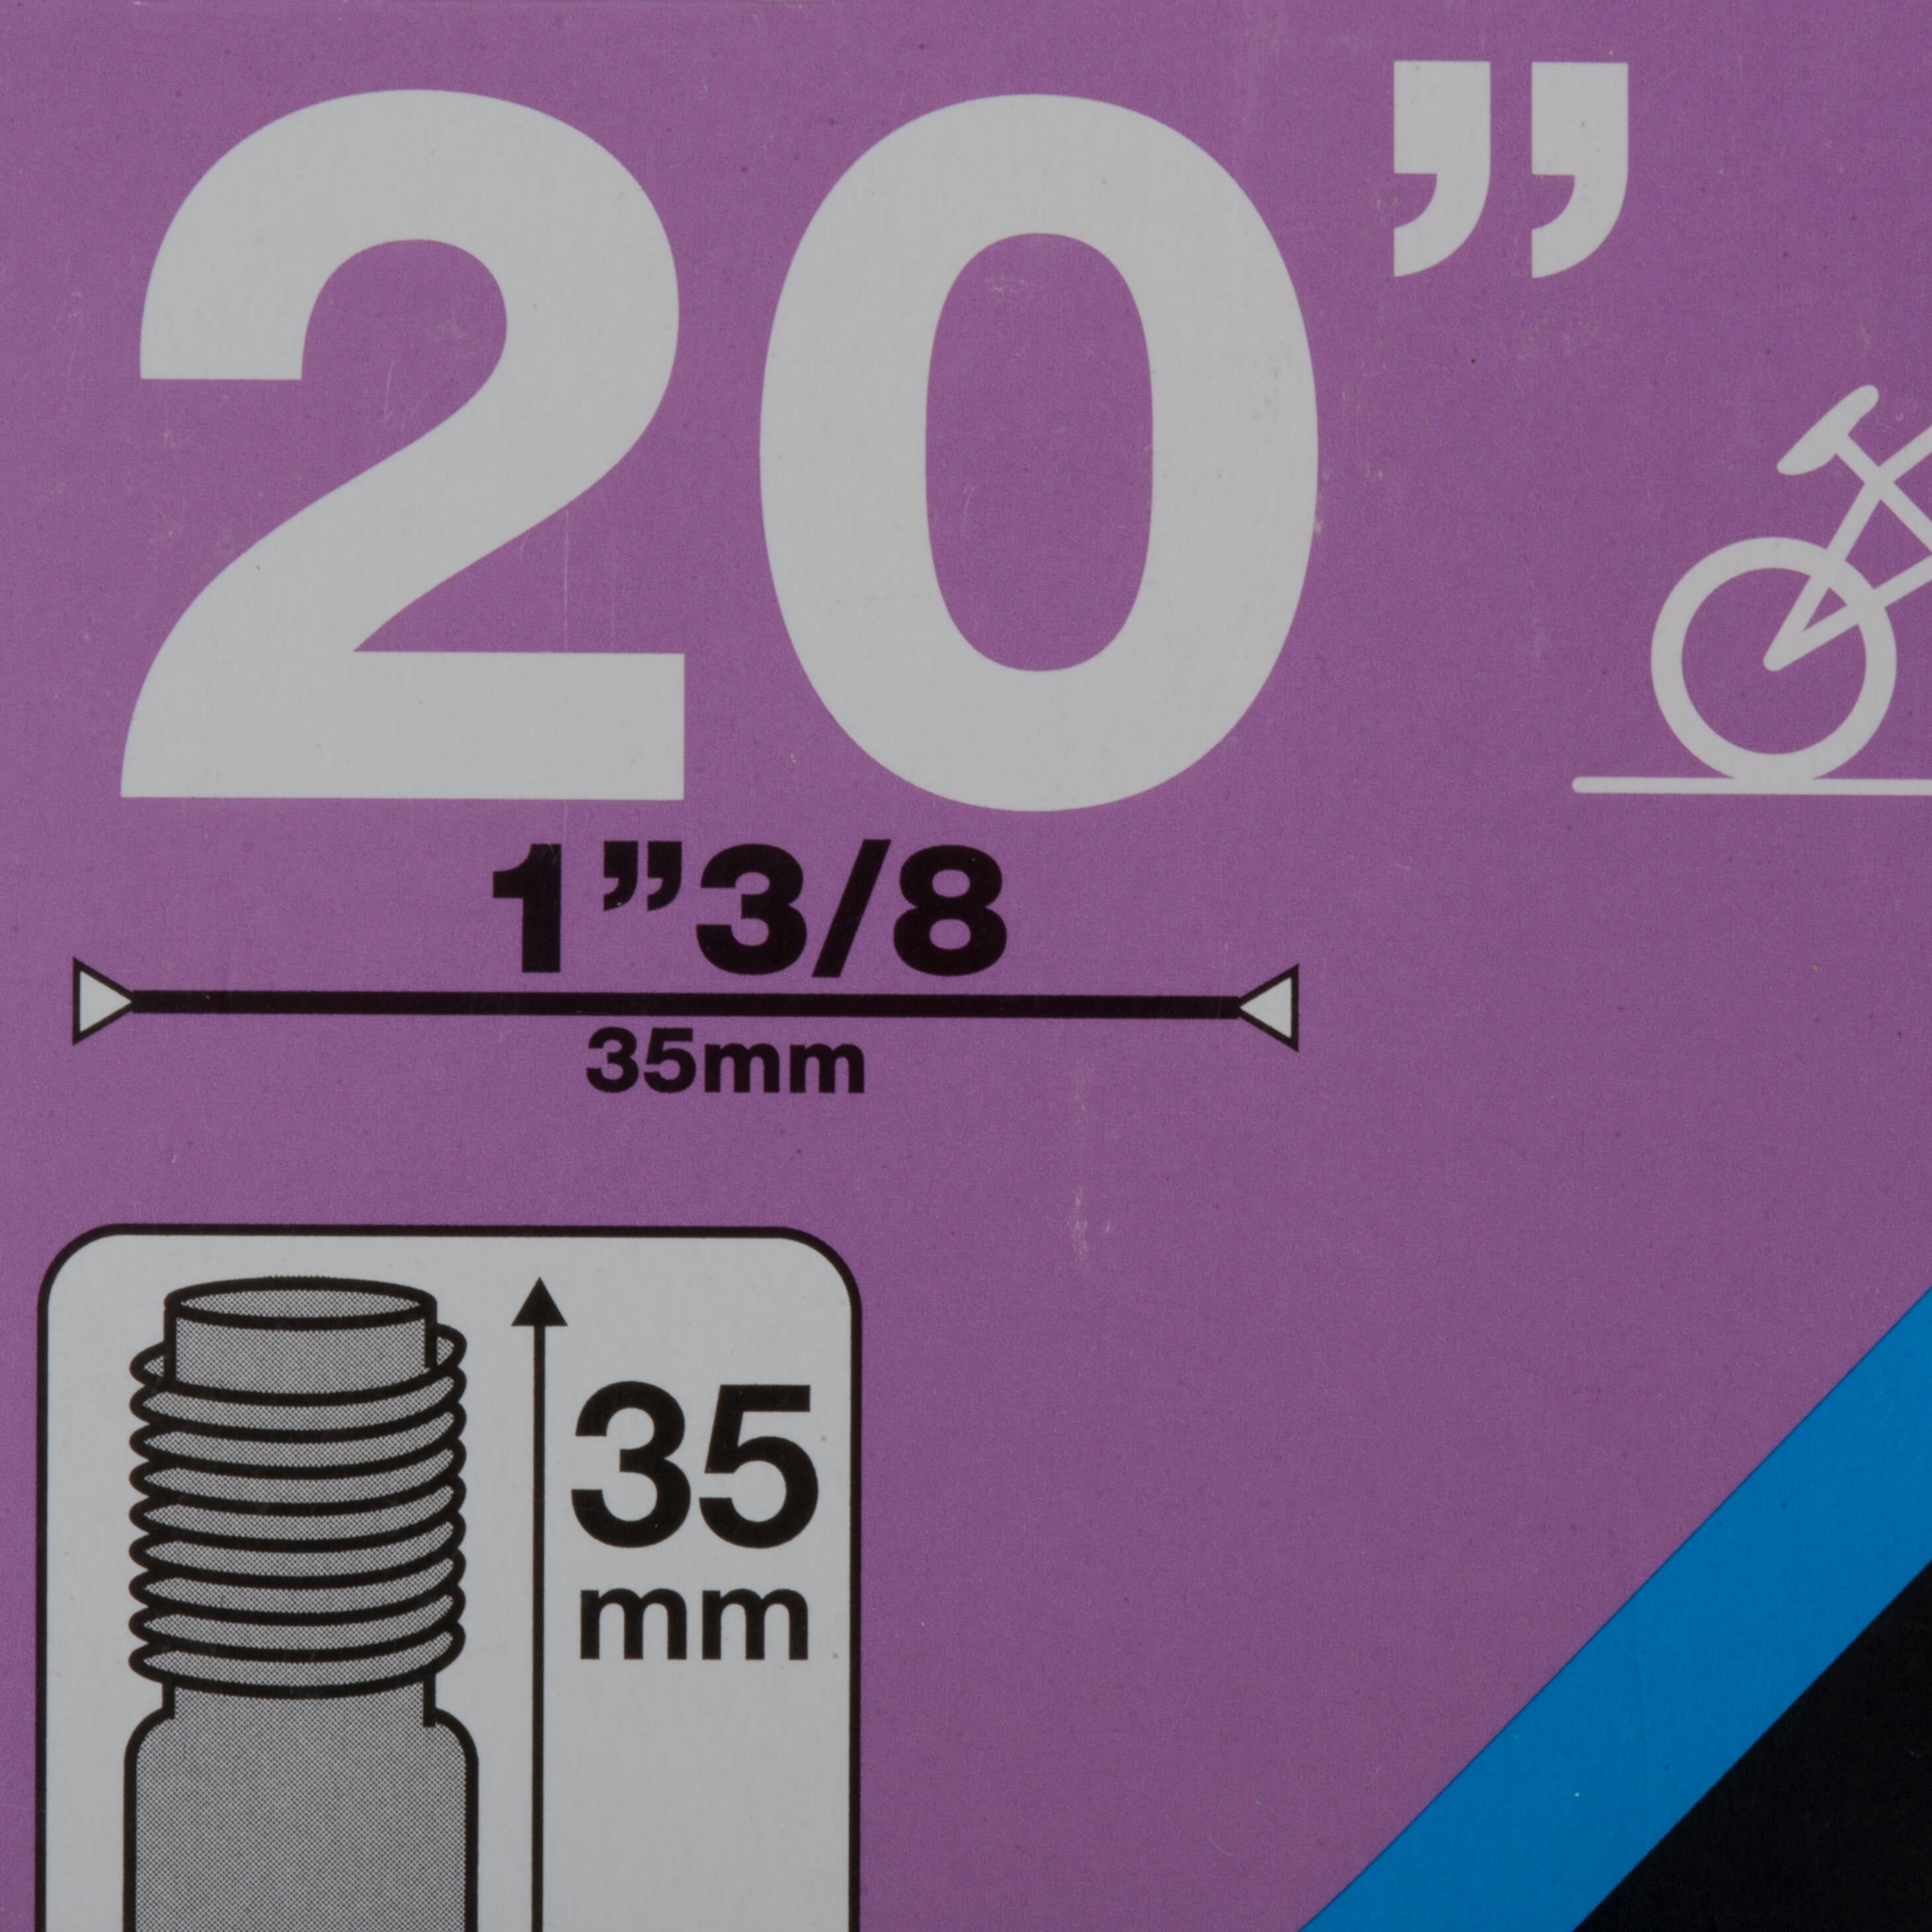 "20""x1-3/8"" / ETRTO 32-40/438-451 Schrader Valve Inner Tube"